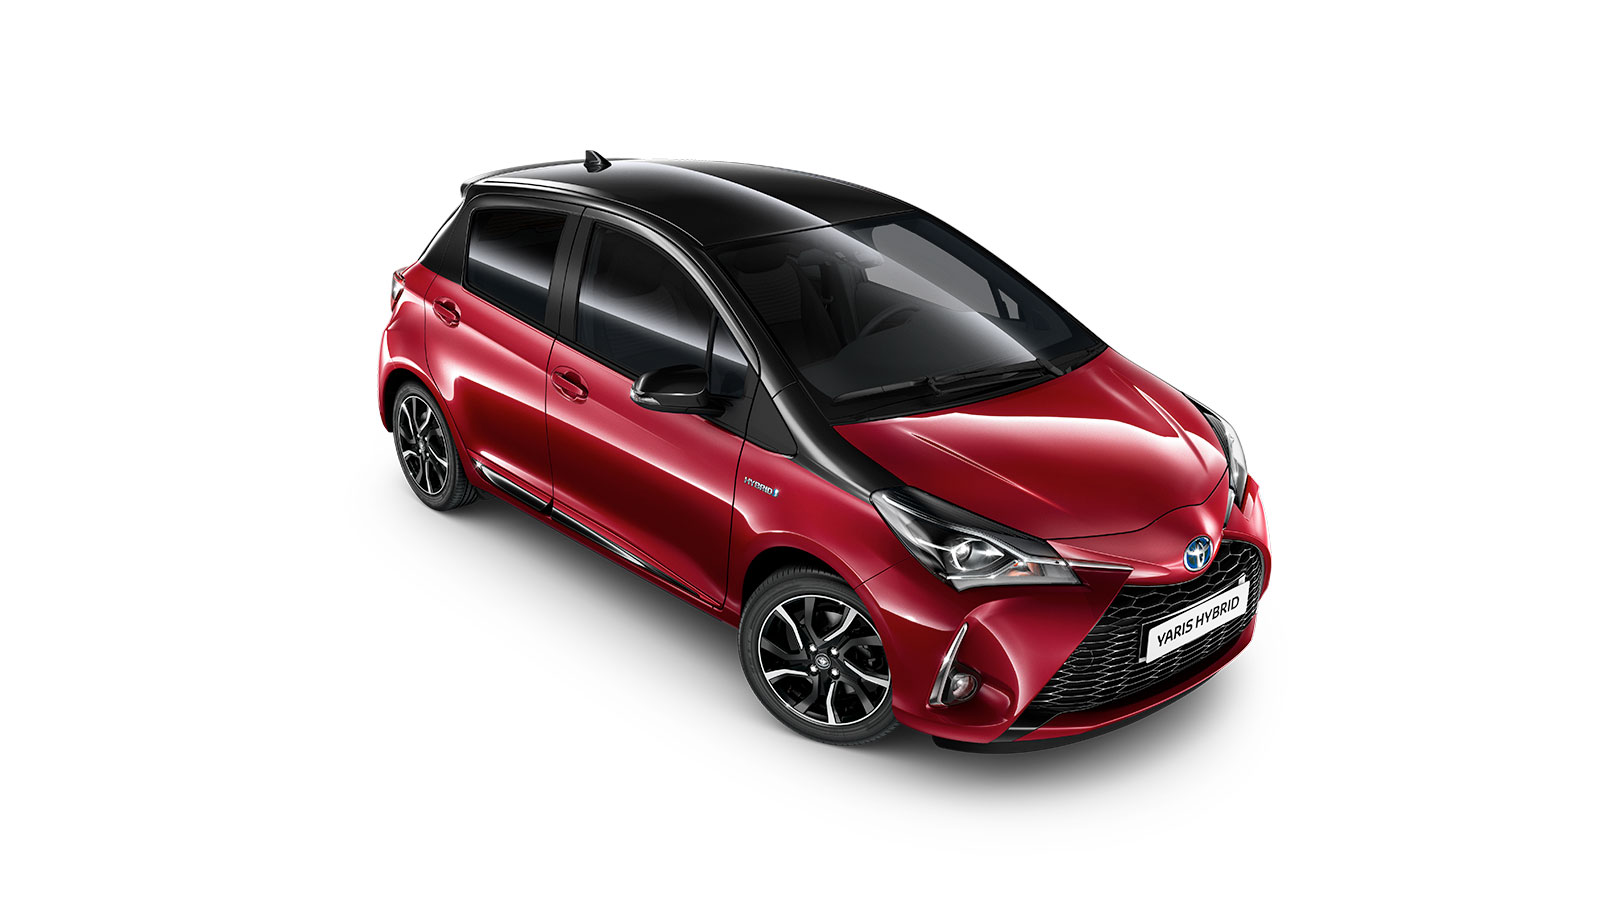 Toyota_Yaris_02.jpg